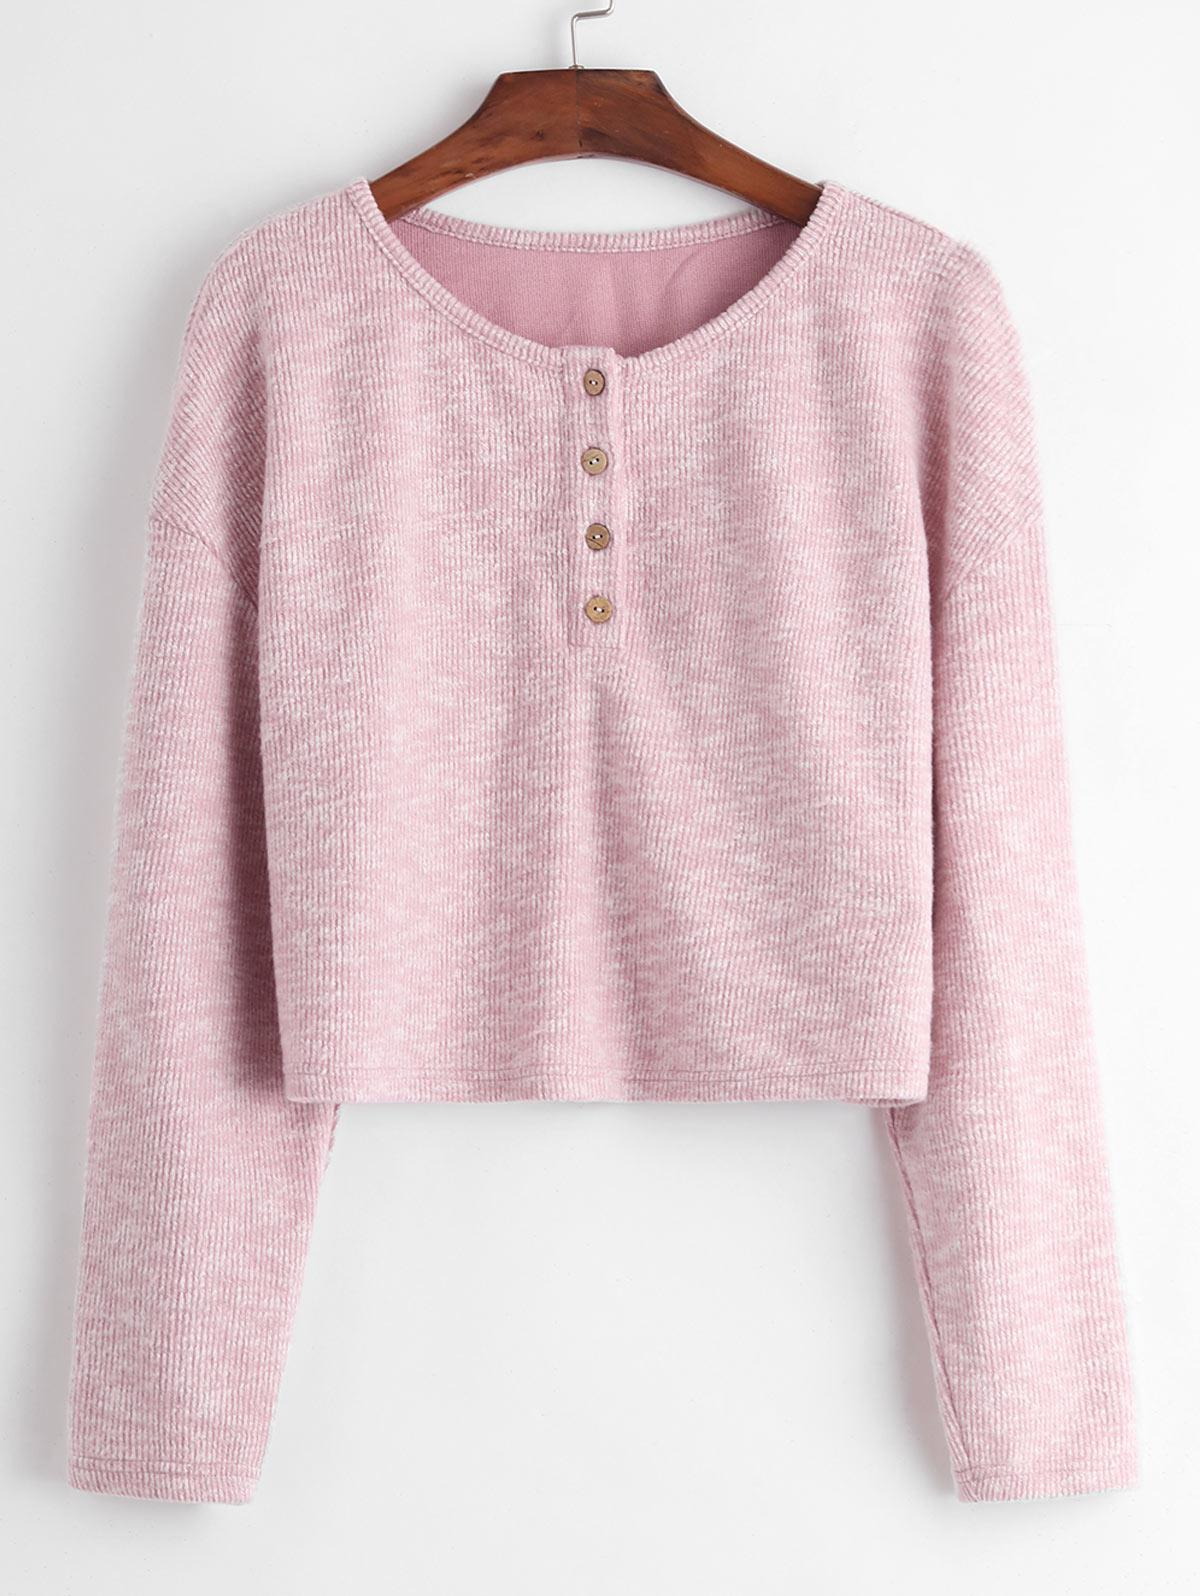 ZAFUL Button Placket Drop Shoulder Crop Sweater